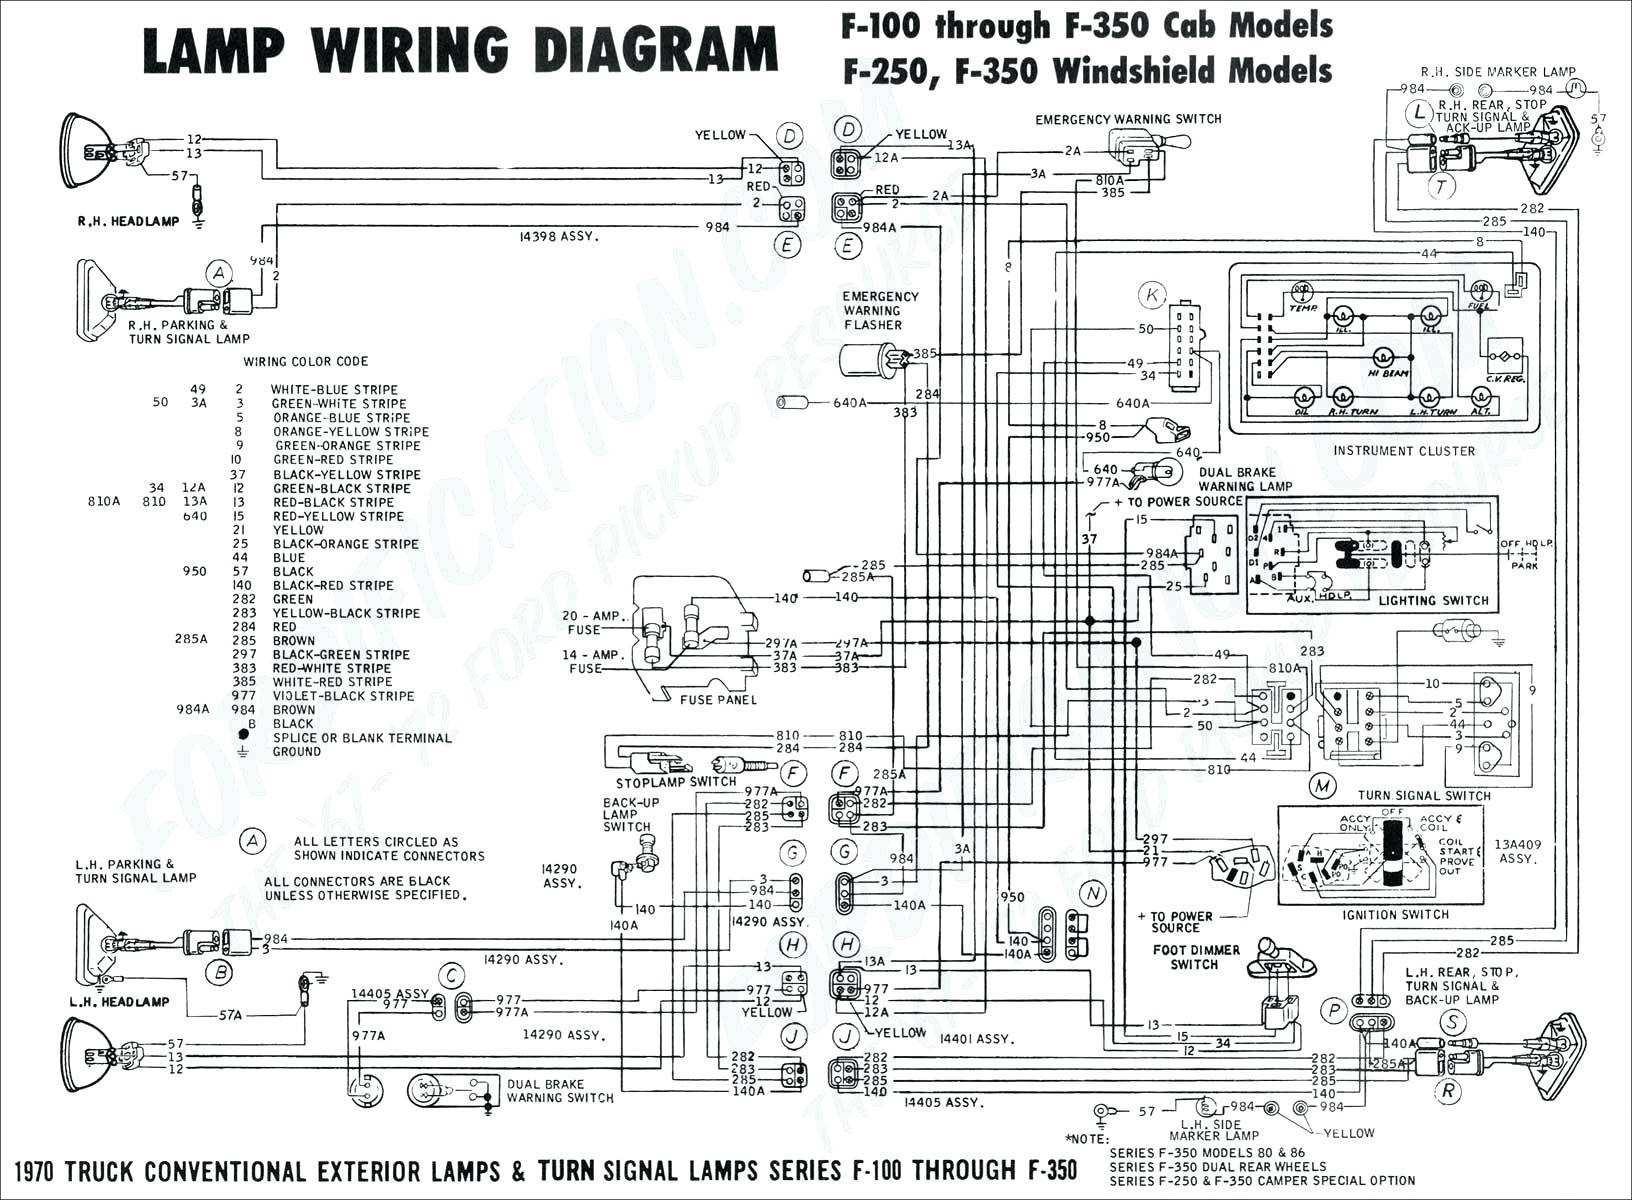 2004 Dodge Ram Fuse Box - Wiring Diagram Data - Dodge Ram 1500 Wiring Diagram